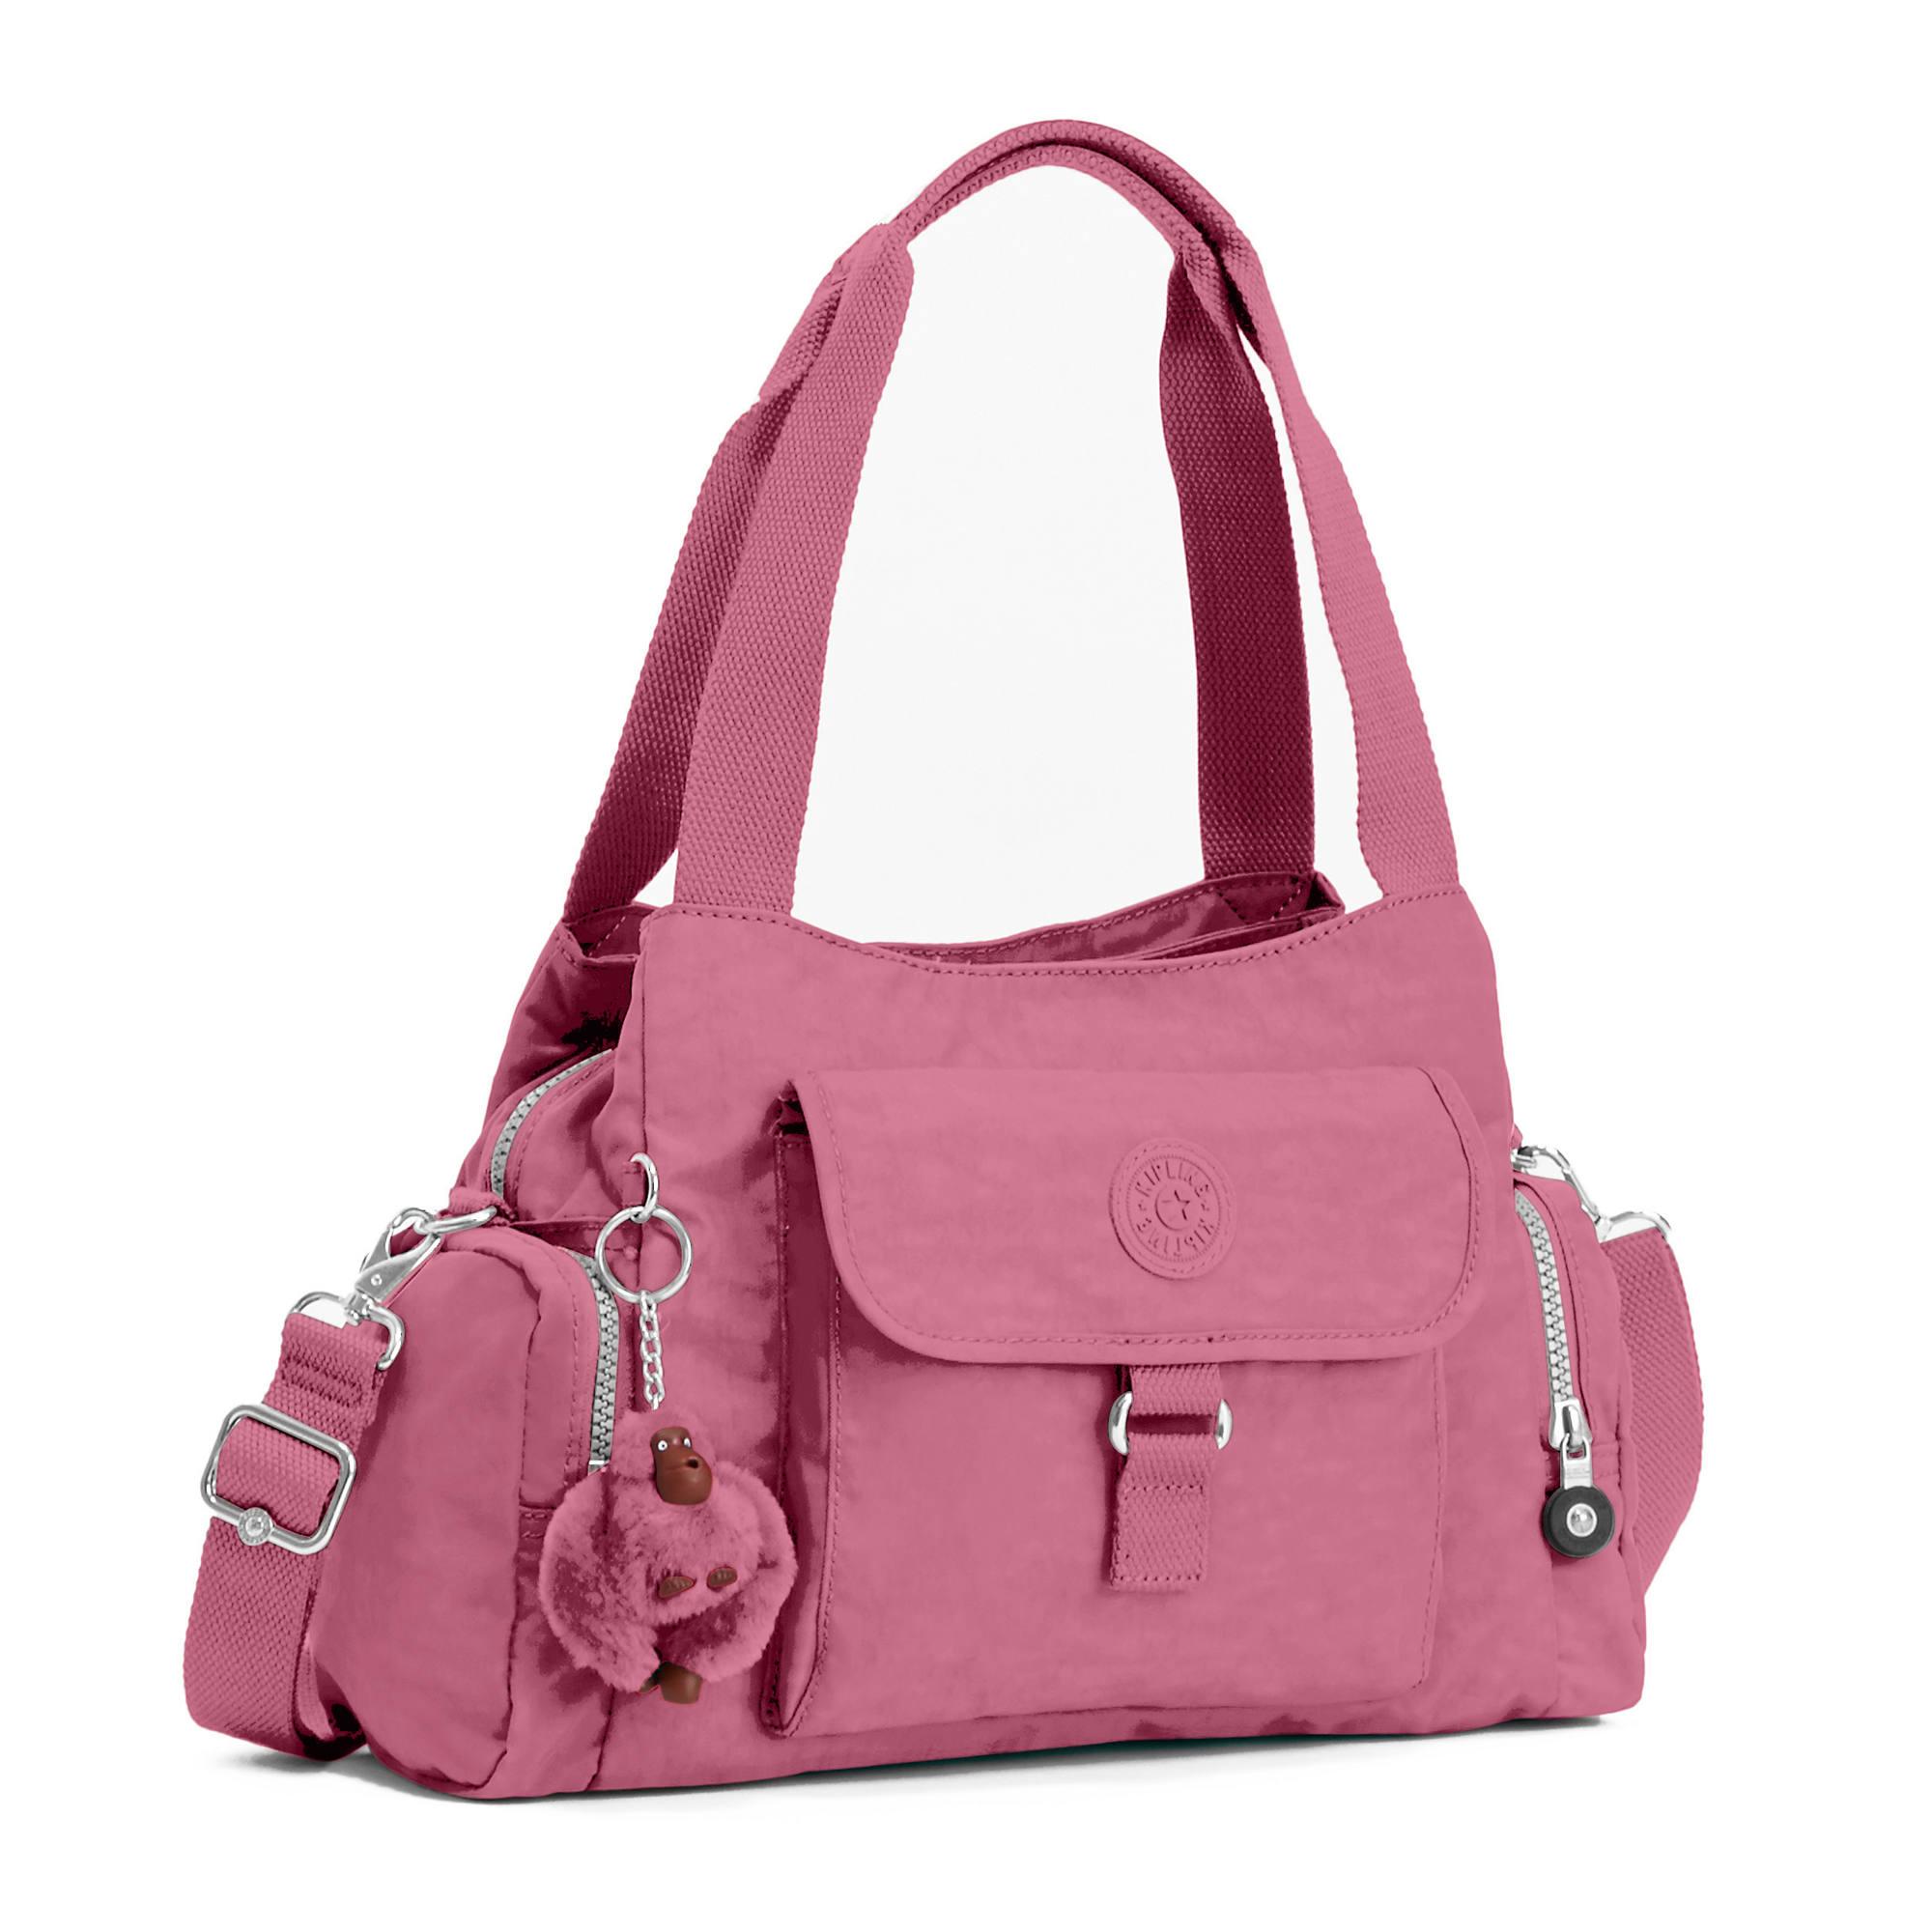 Kipling-Felix-Large-Handbag miniature 26